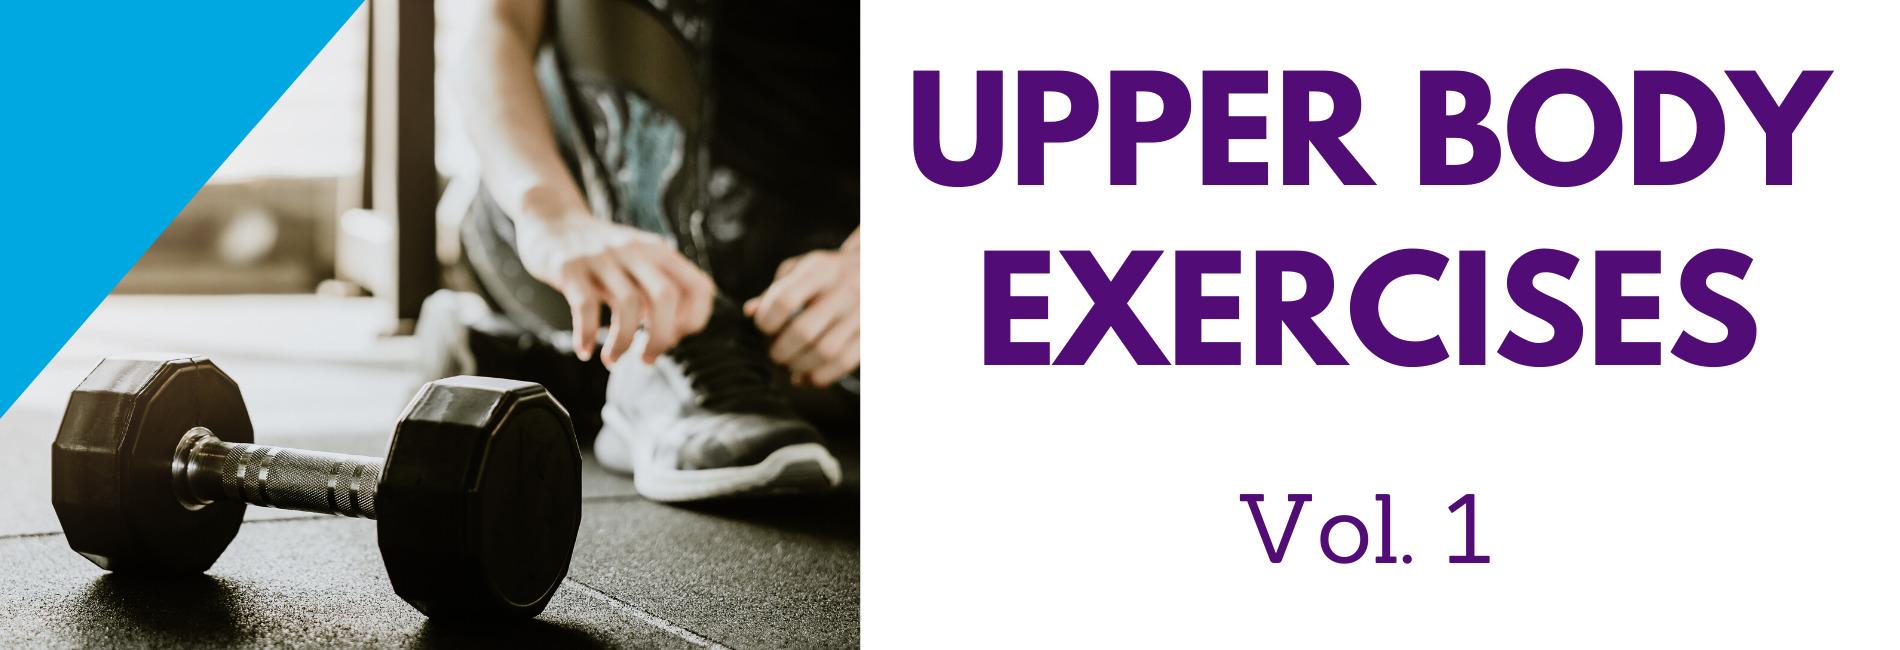 Learn Upper Body Exercises using GIFs.